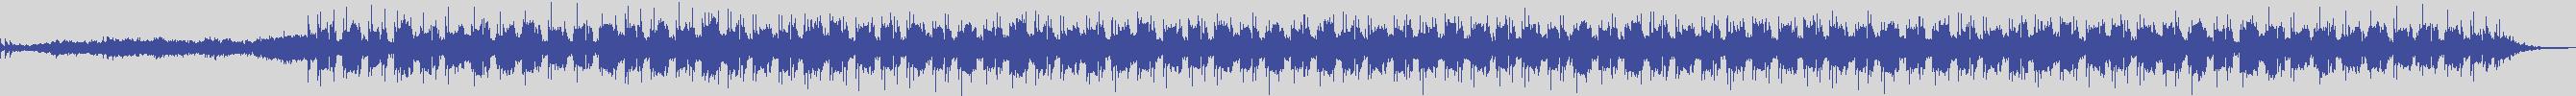 just_digital_records [JS1224] Nikon - Whisful Thing [Original Mix] audio wave form